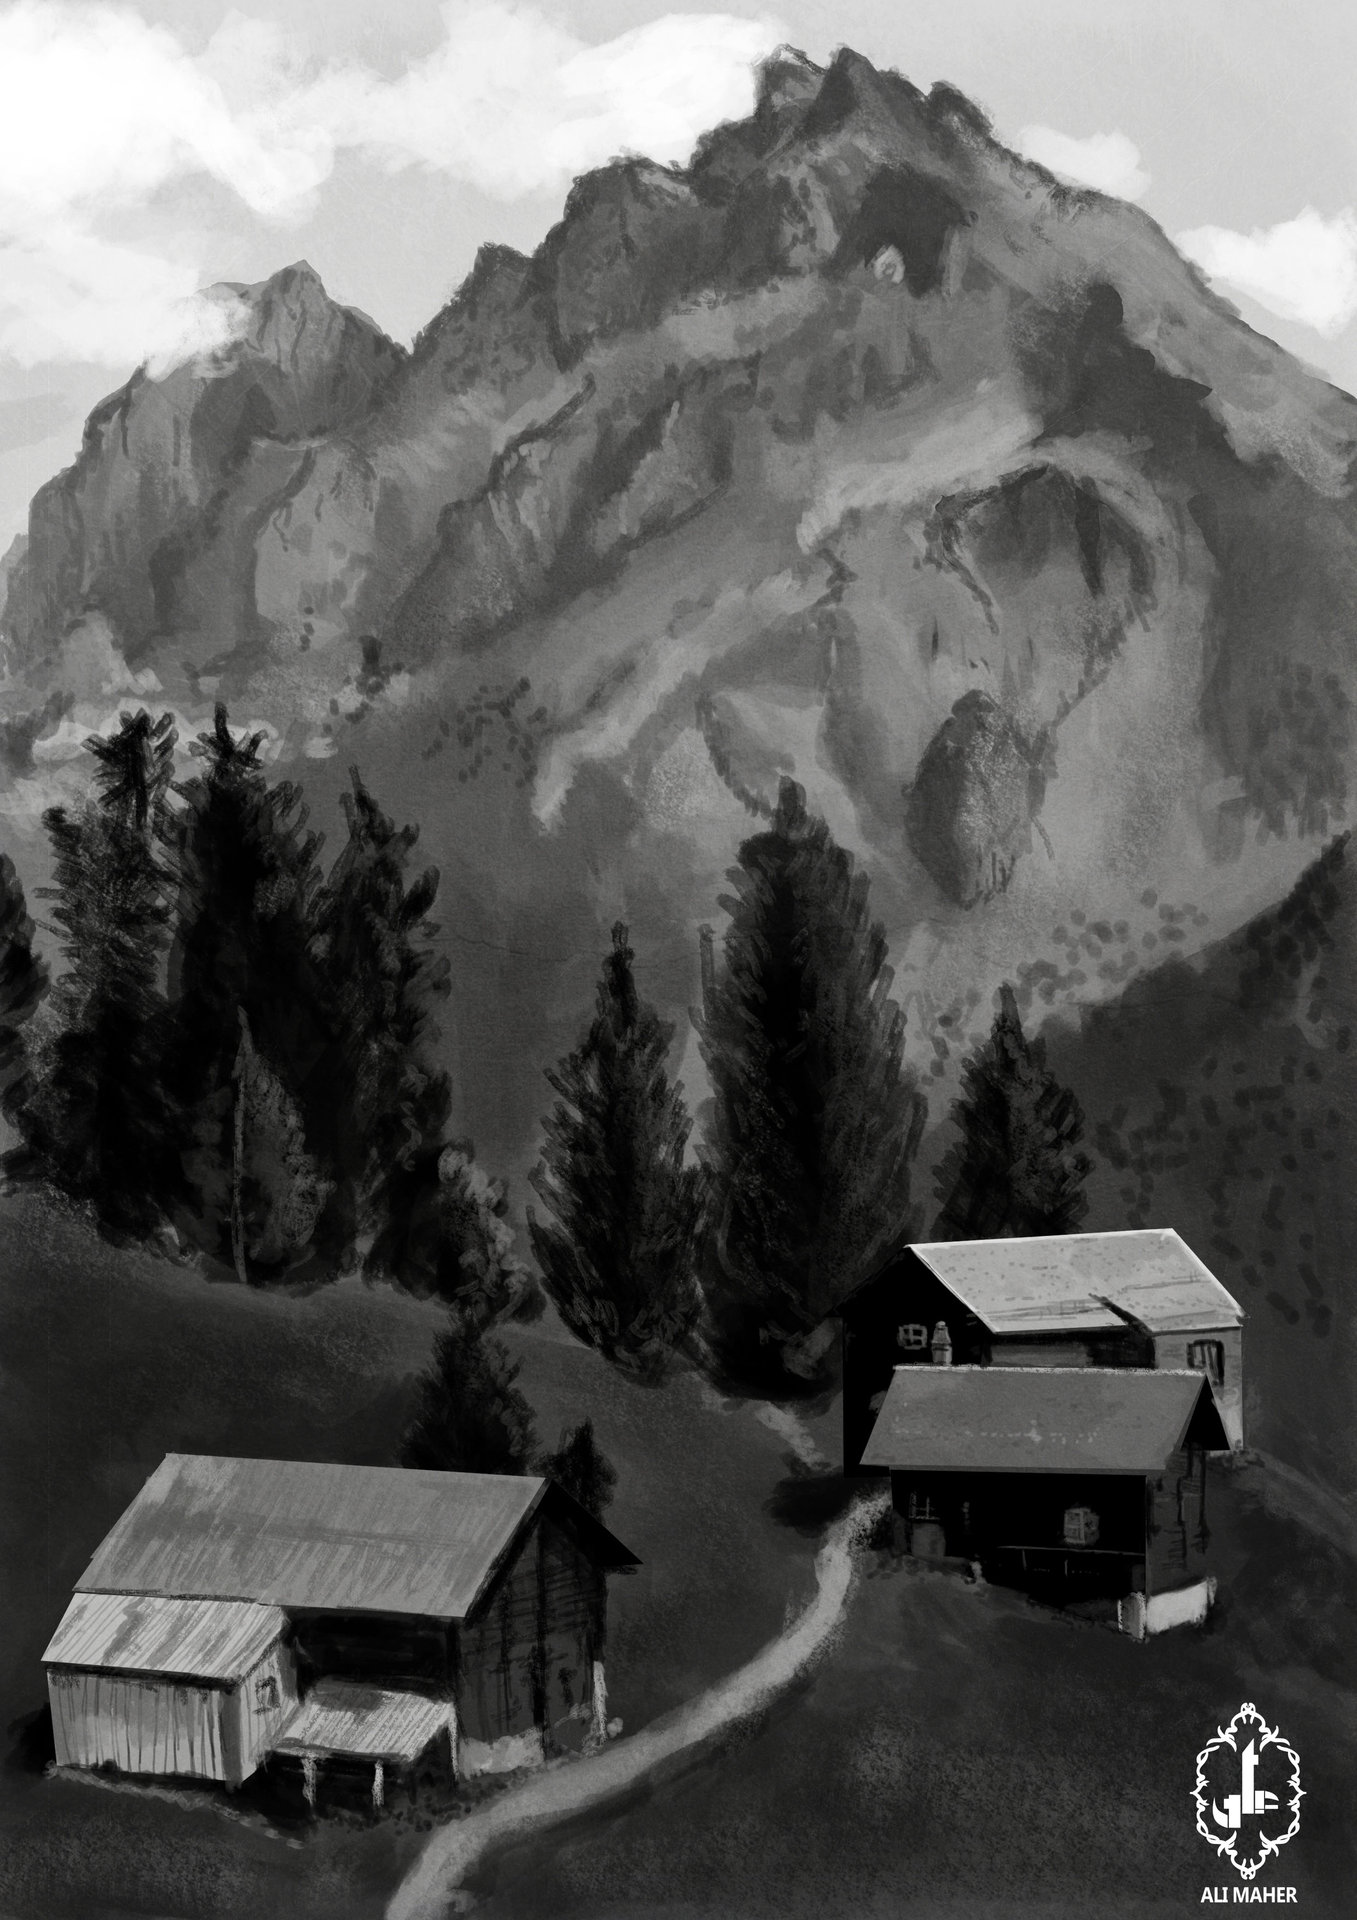 Ali maher scene mountain